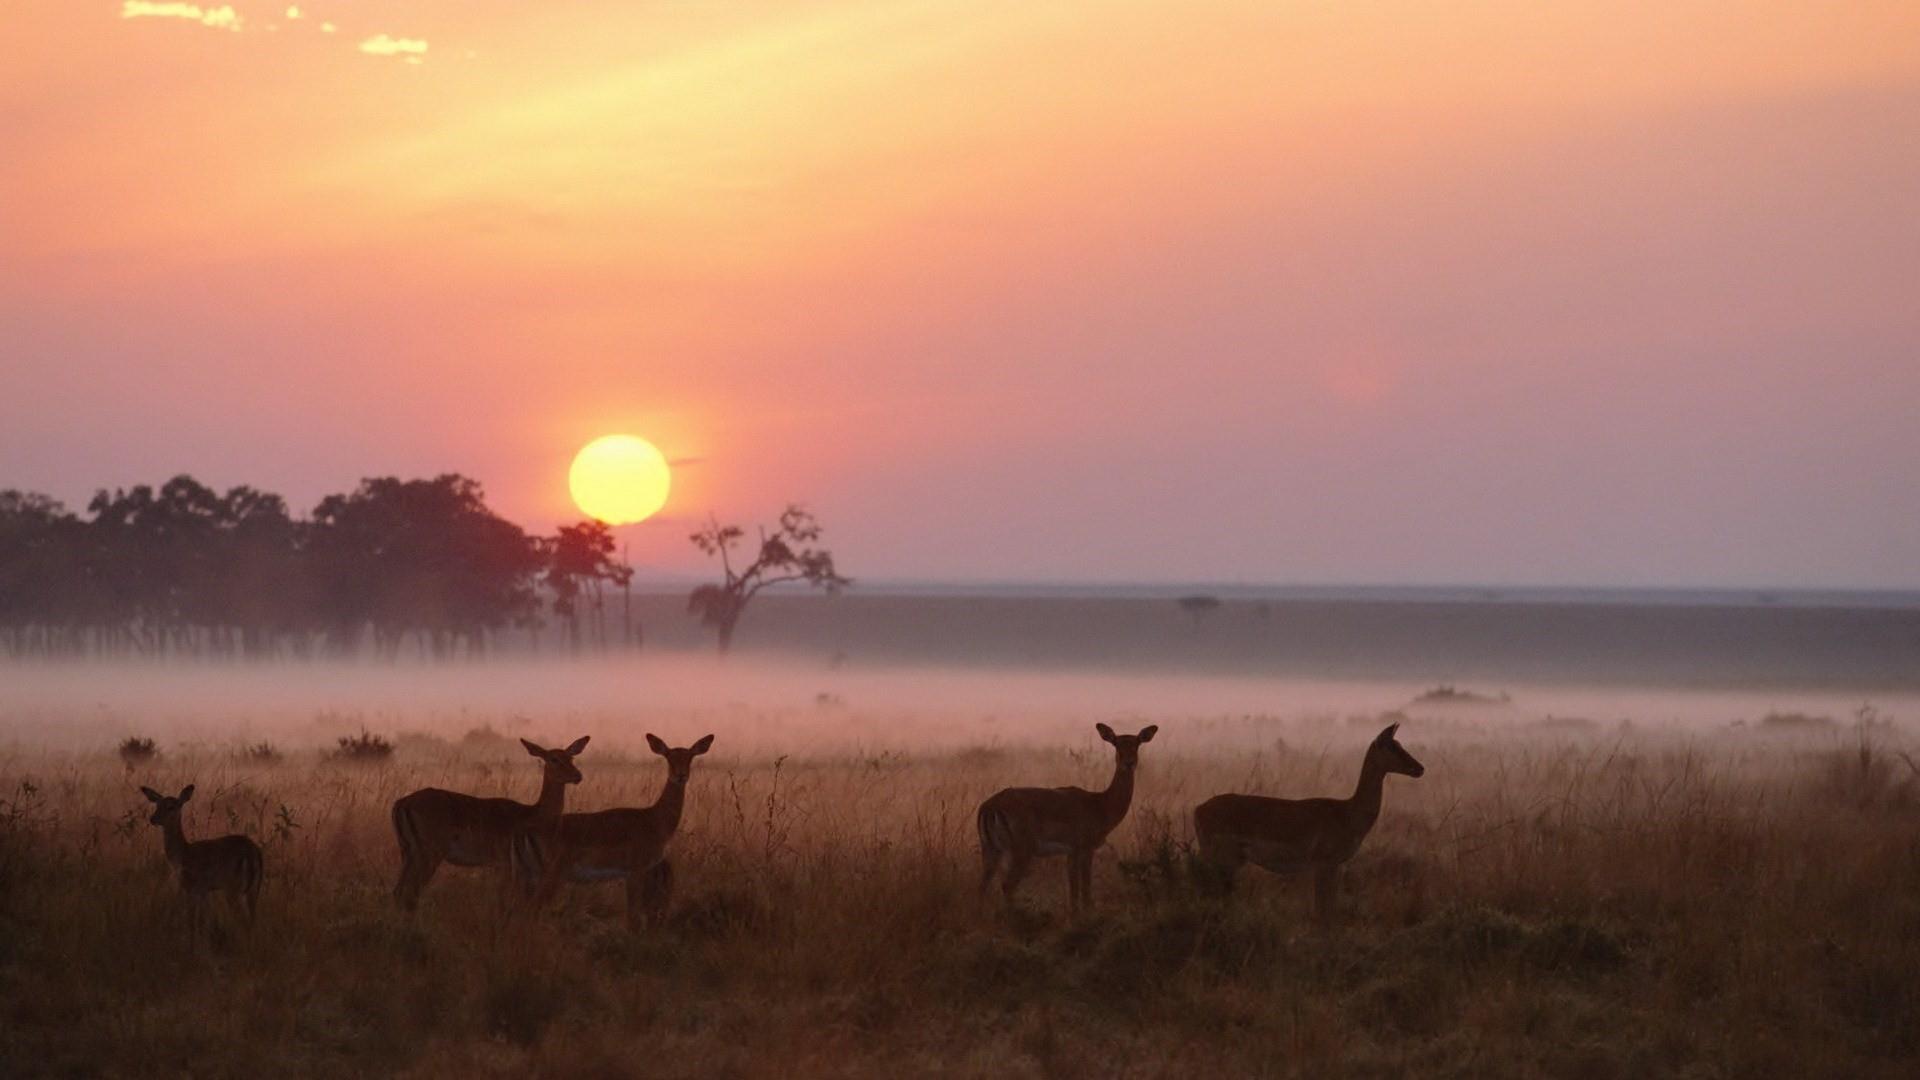 Sunrise over Maasai Mara National Reserve, Kenya wallpaper